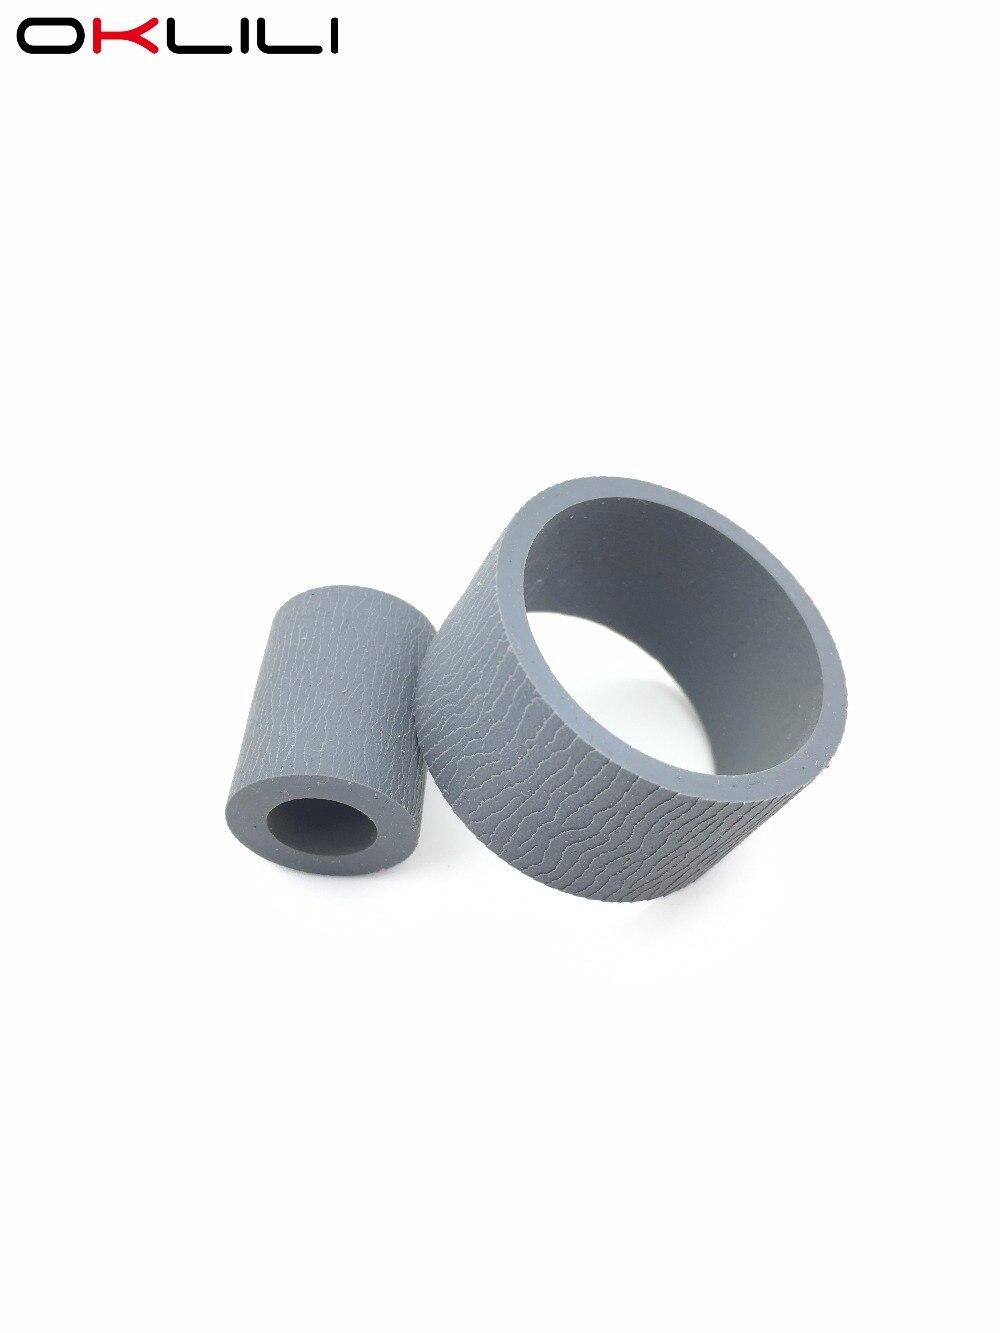 1X ретард SUB PICK в сборе подача пикапа ролик для Epson ME10 L110 L111 L120 L130 L210 L220 L211 L300 L301 L303 L310 L350 L351 L353